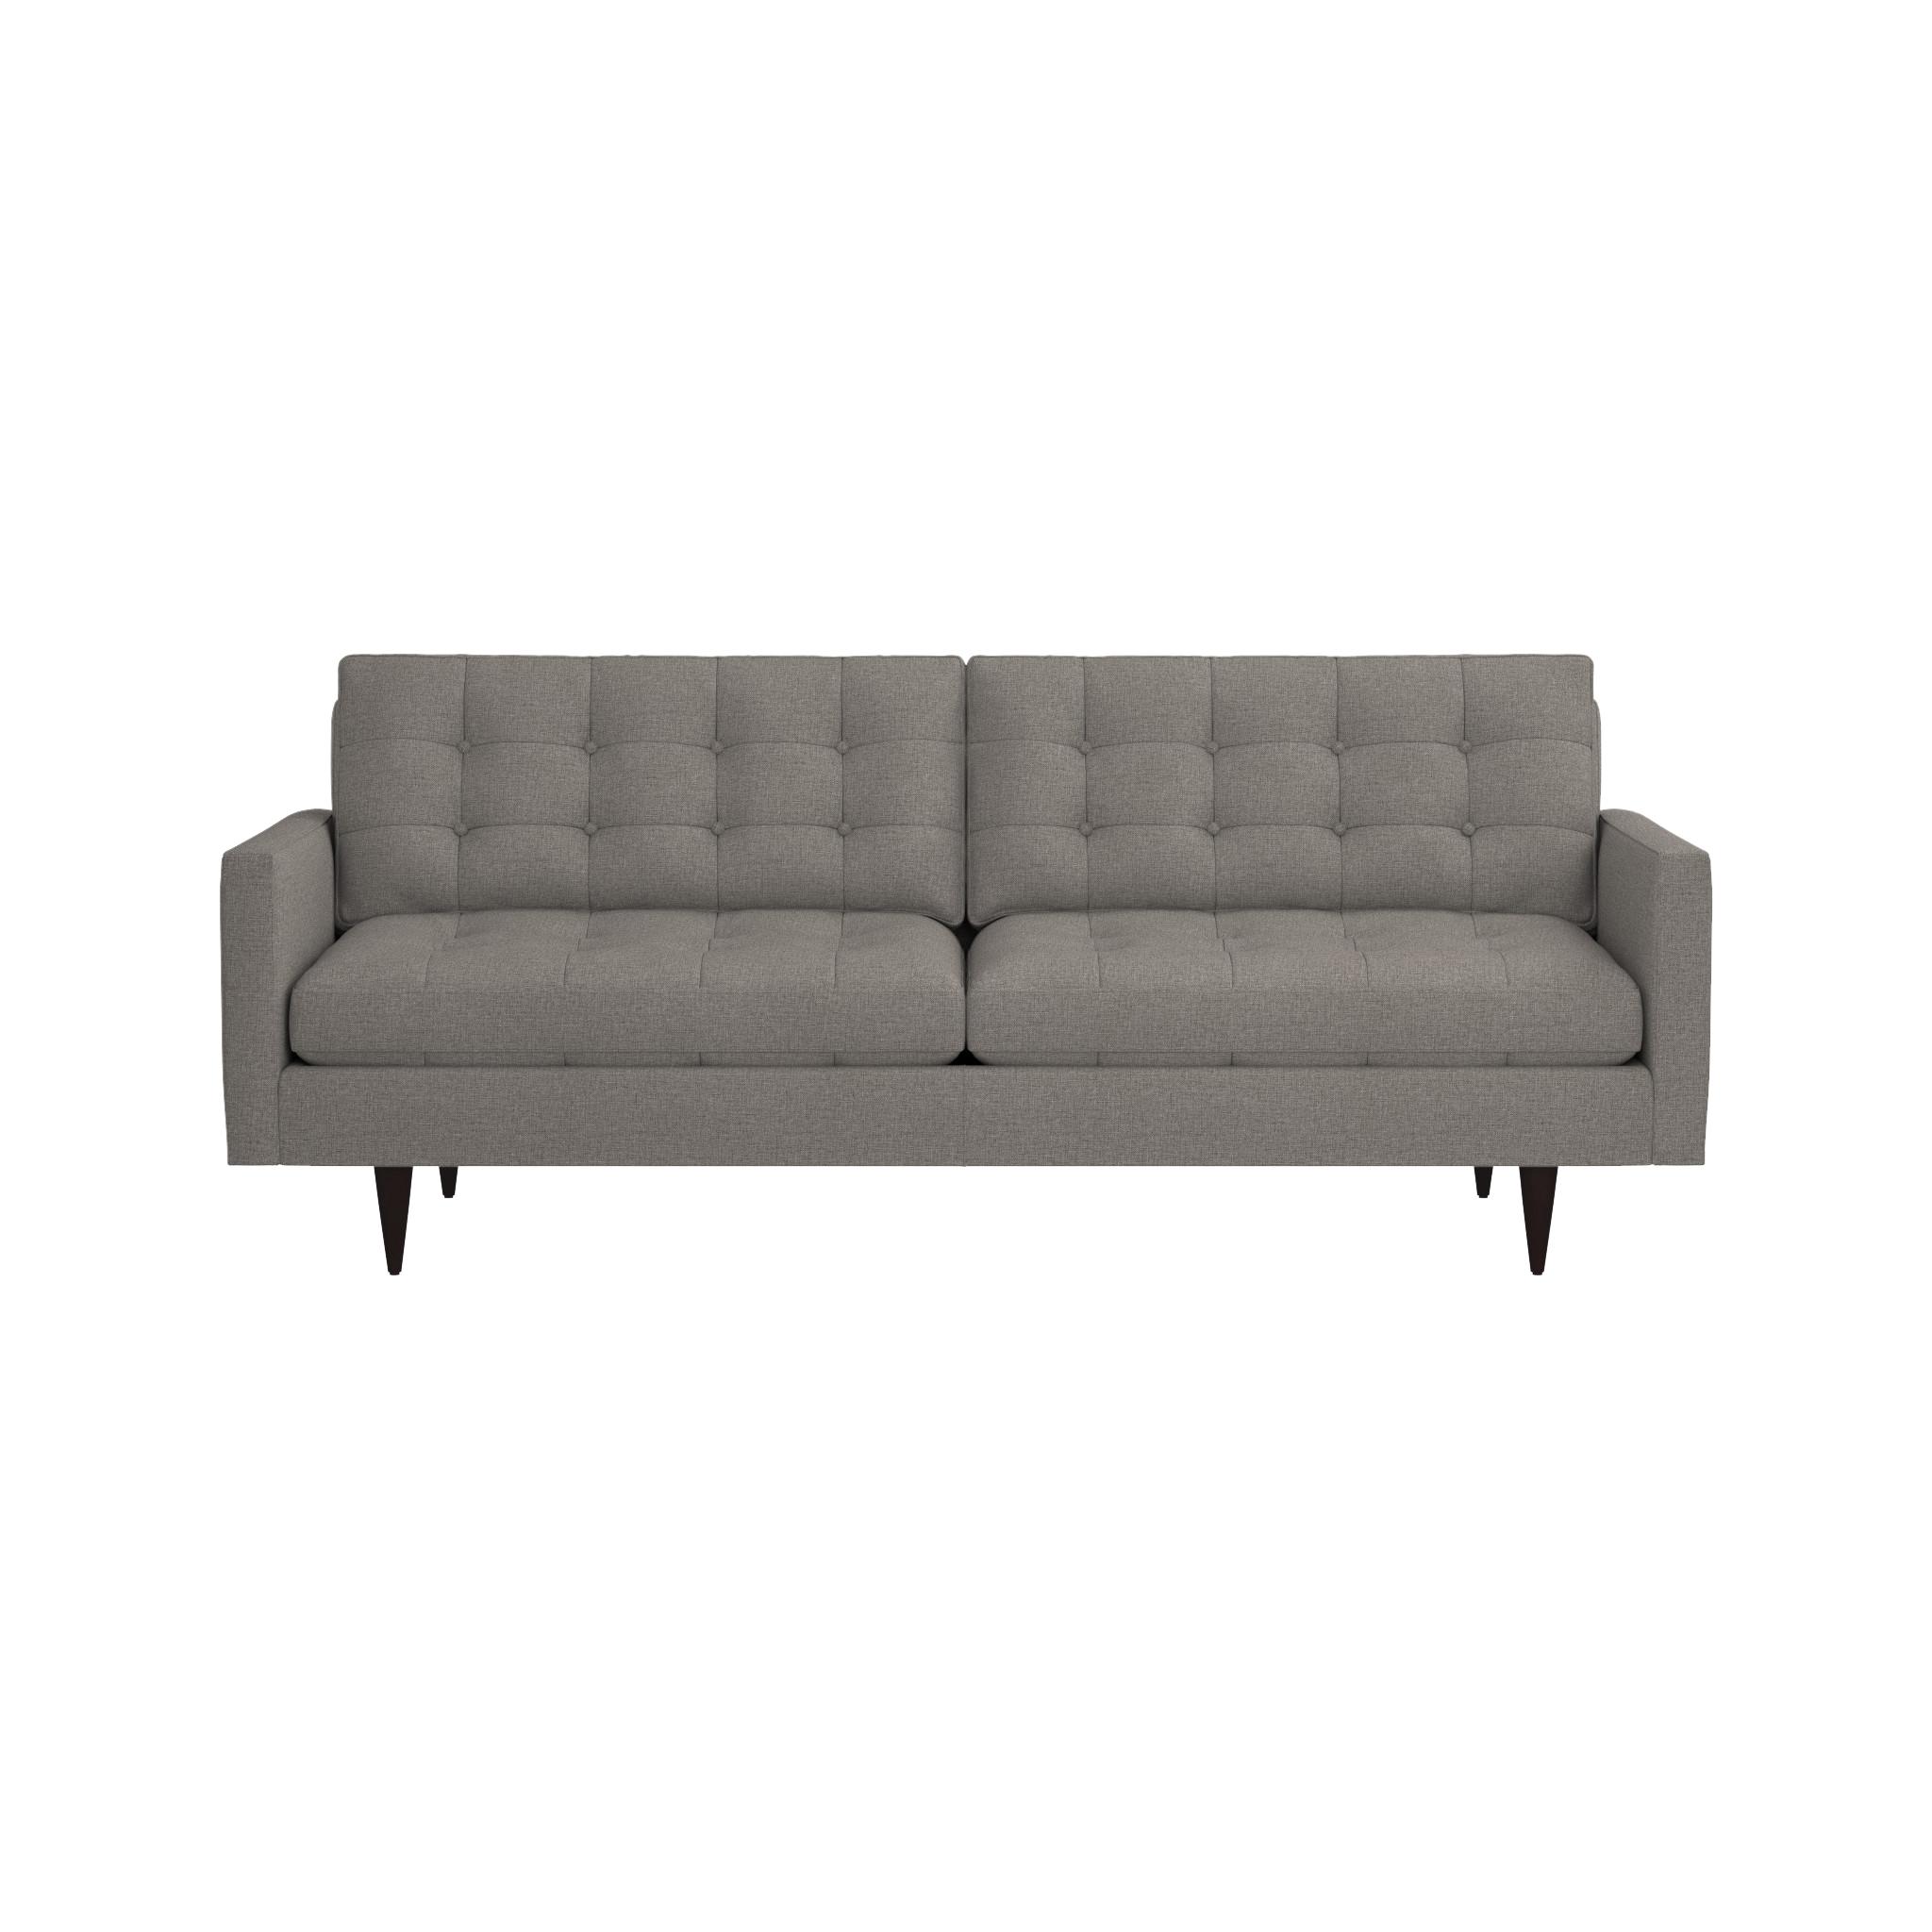 crate and barrel sleeper sofa flexsteel capitol review 20 inspirations sleepers ideas